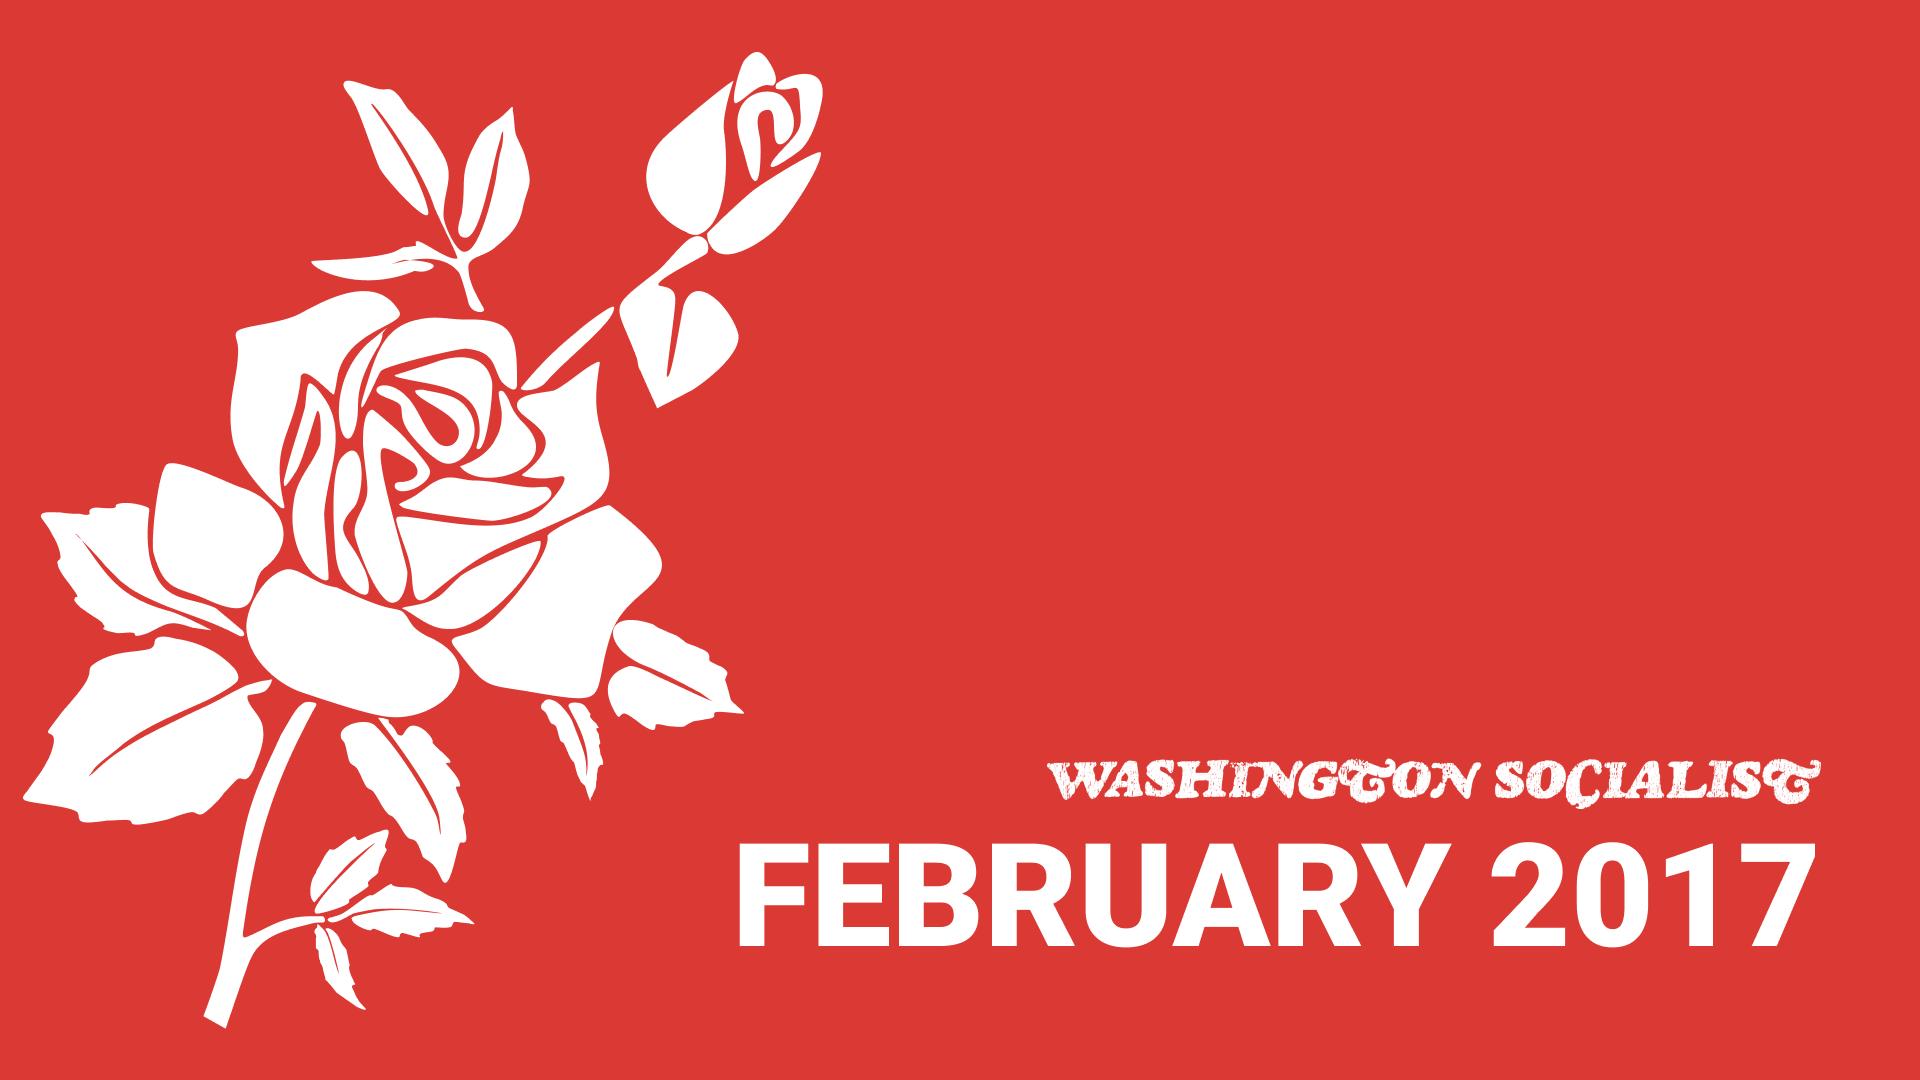 Washington Socialist Cover, February 2017